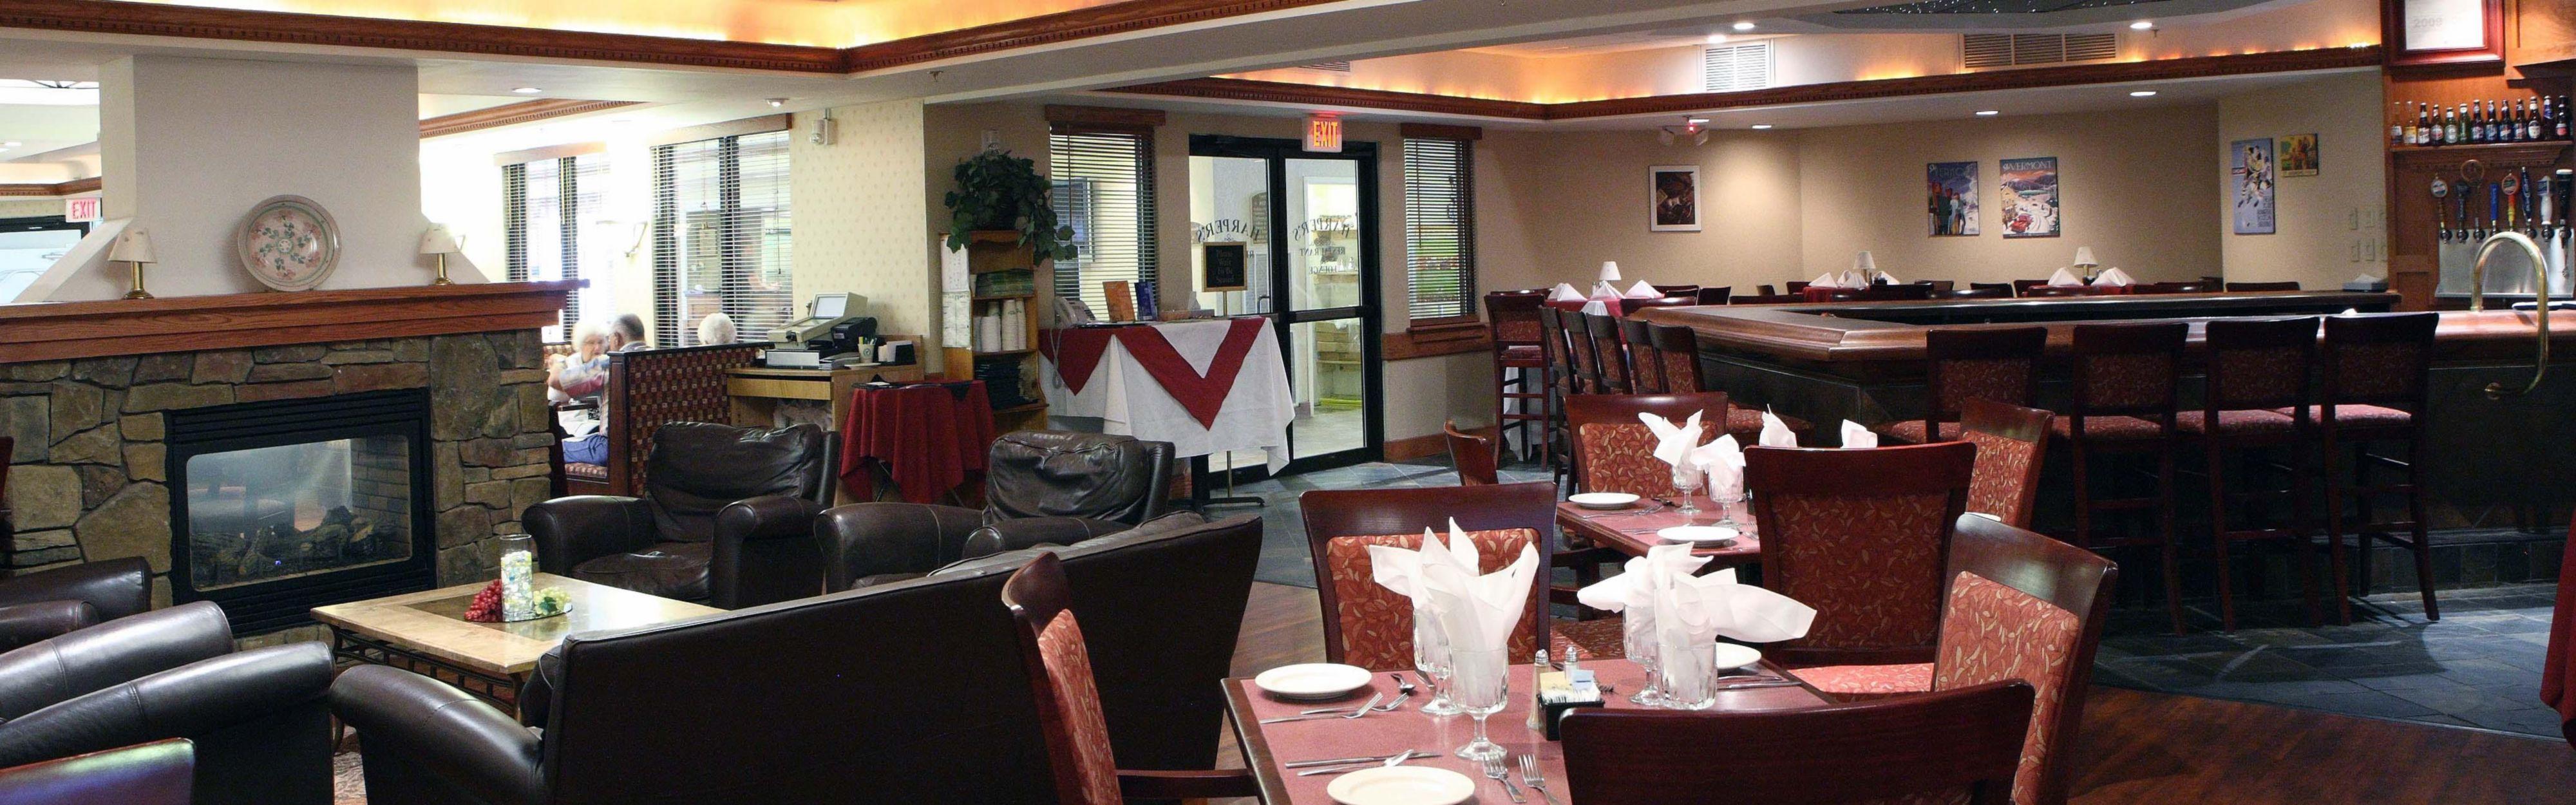 Holiday Inn Burlington image 3